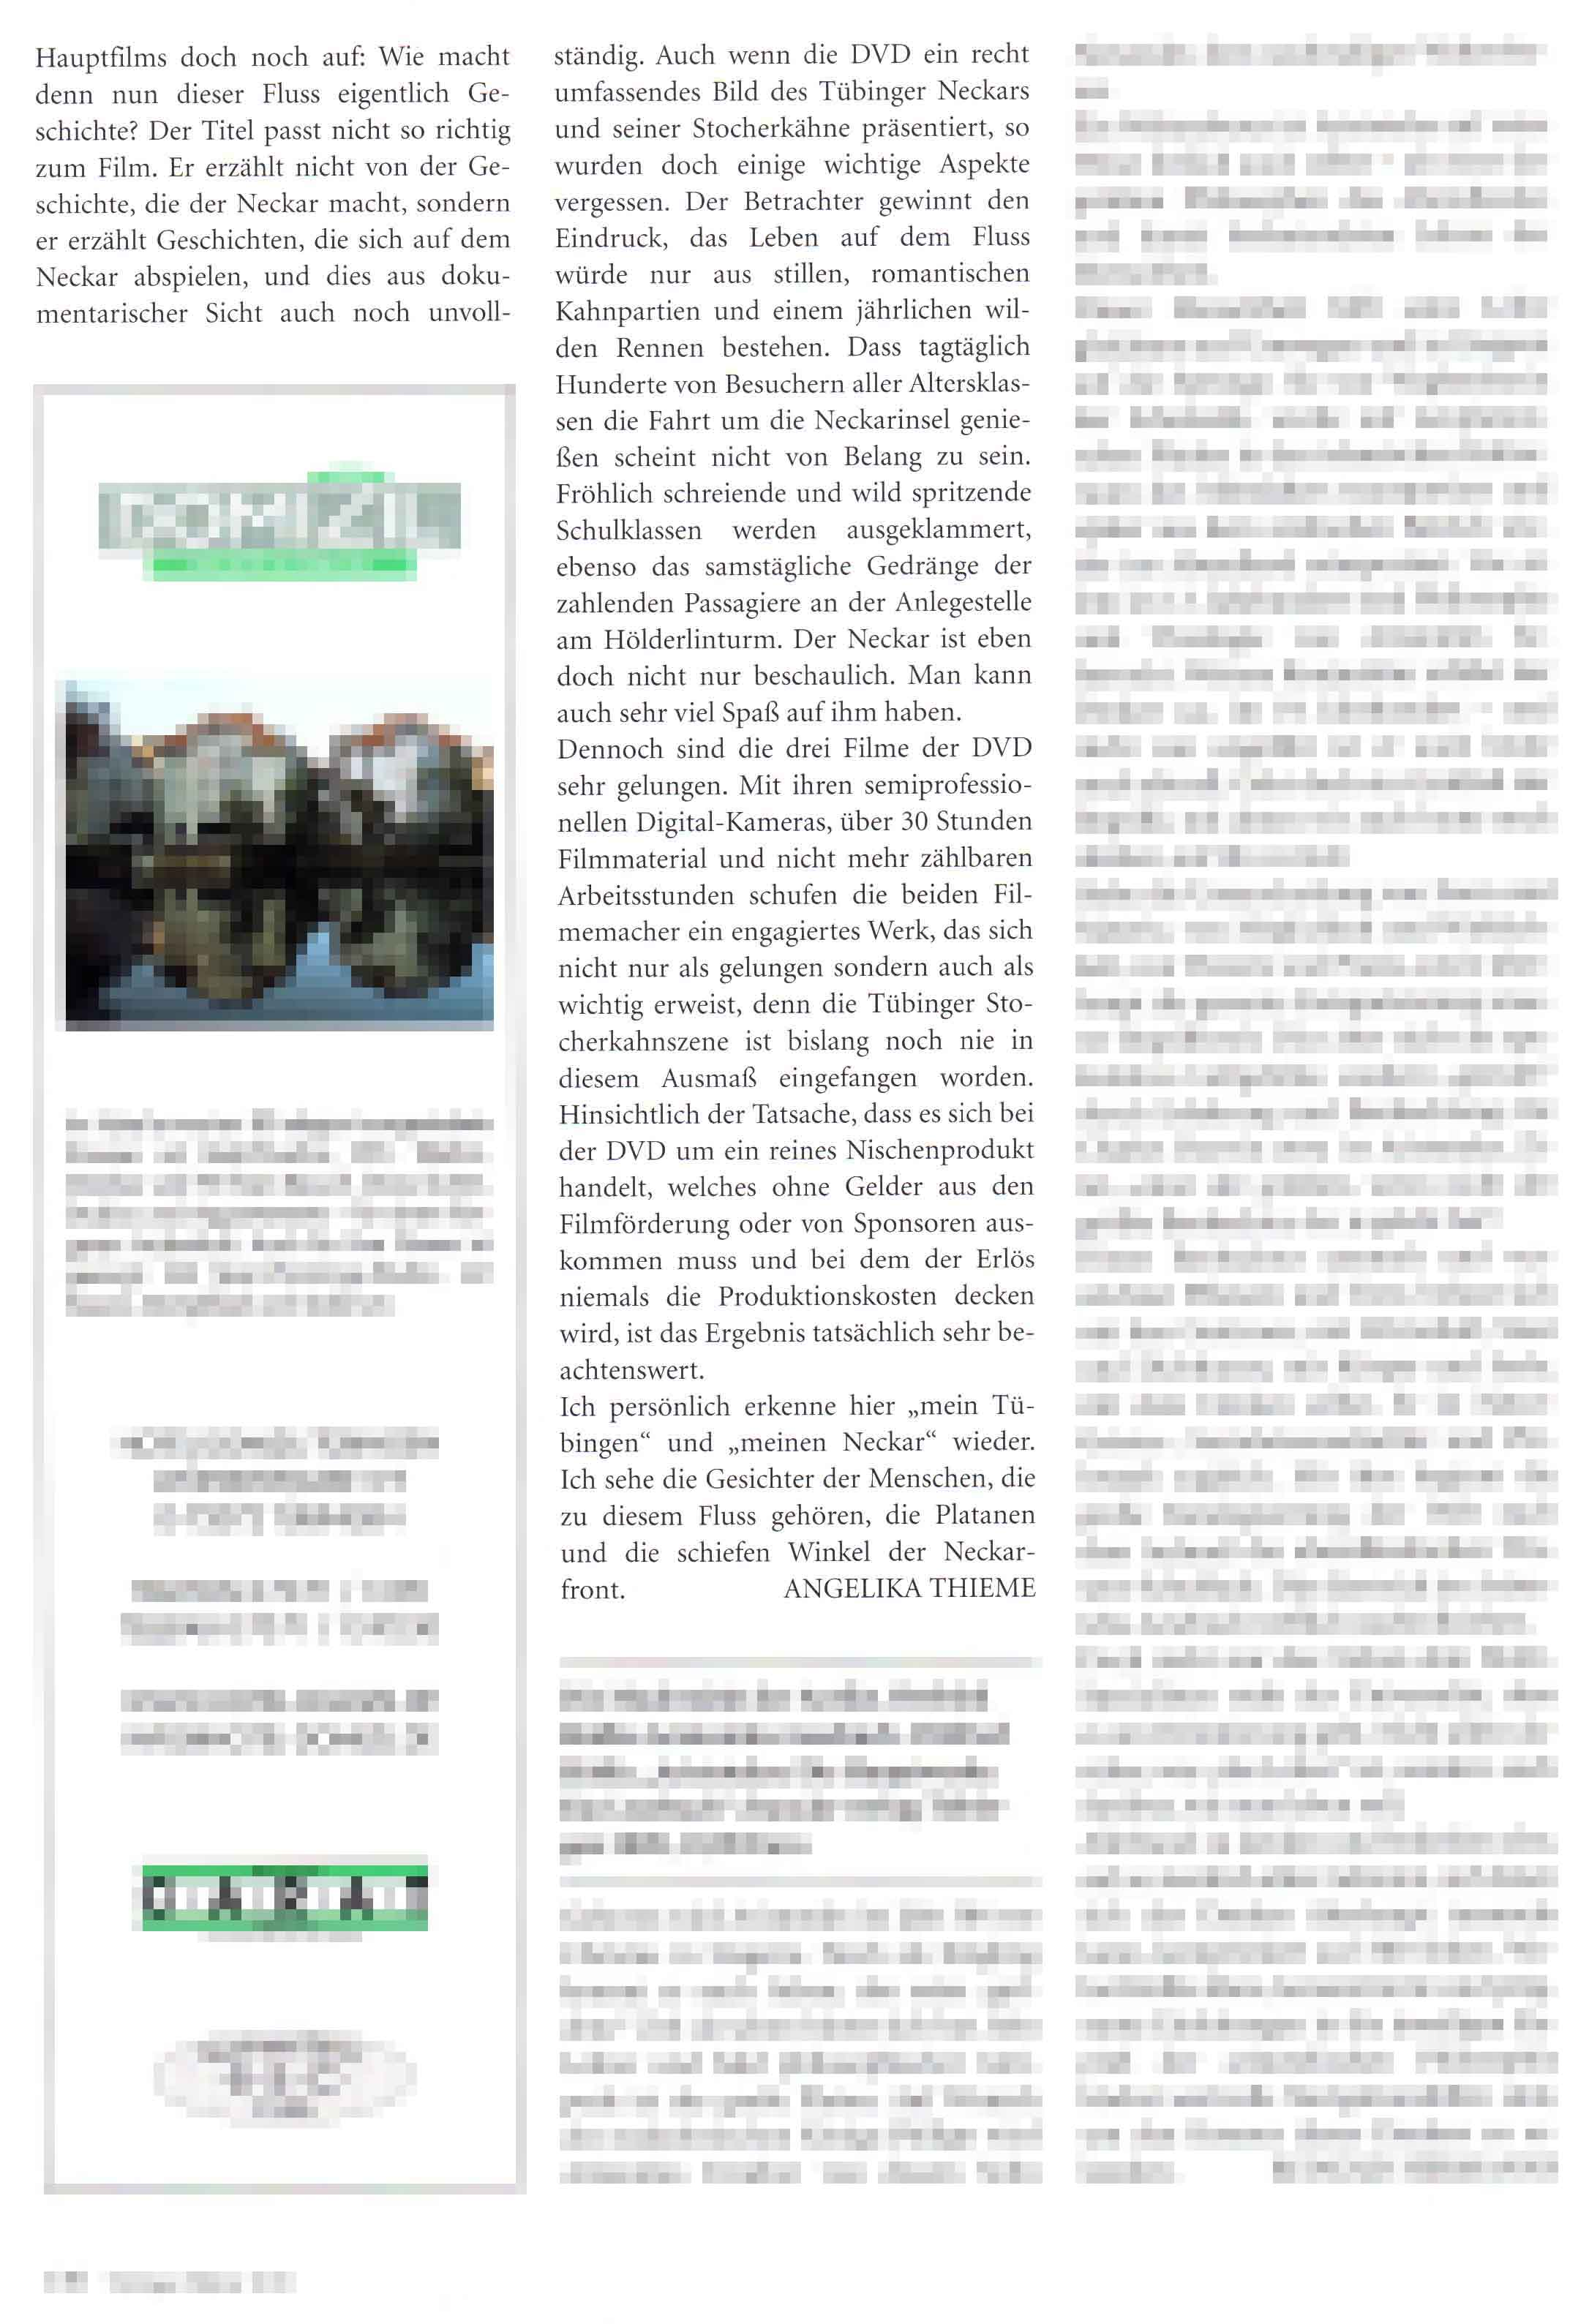 Presse Tuebinger Blätter 2